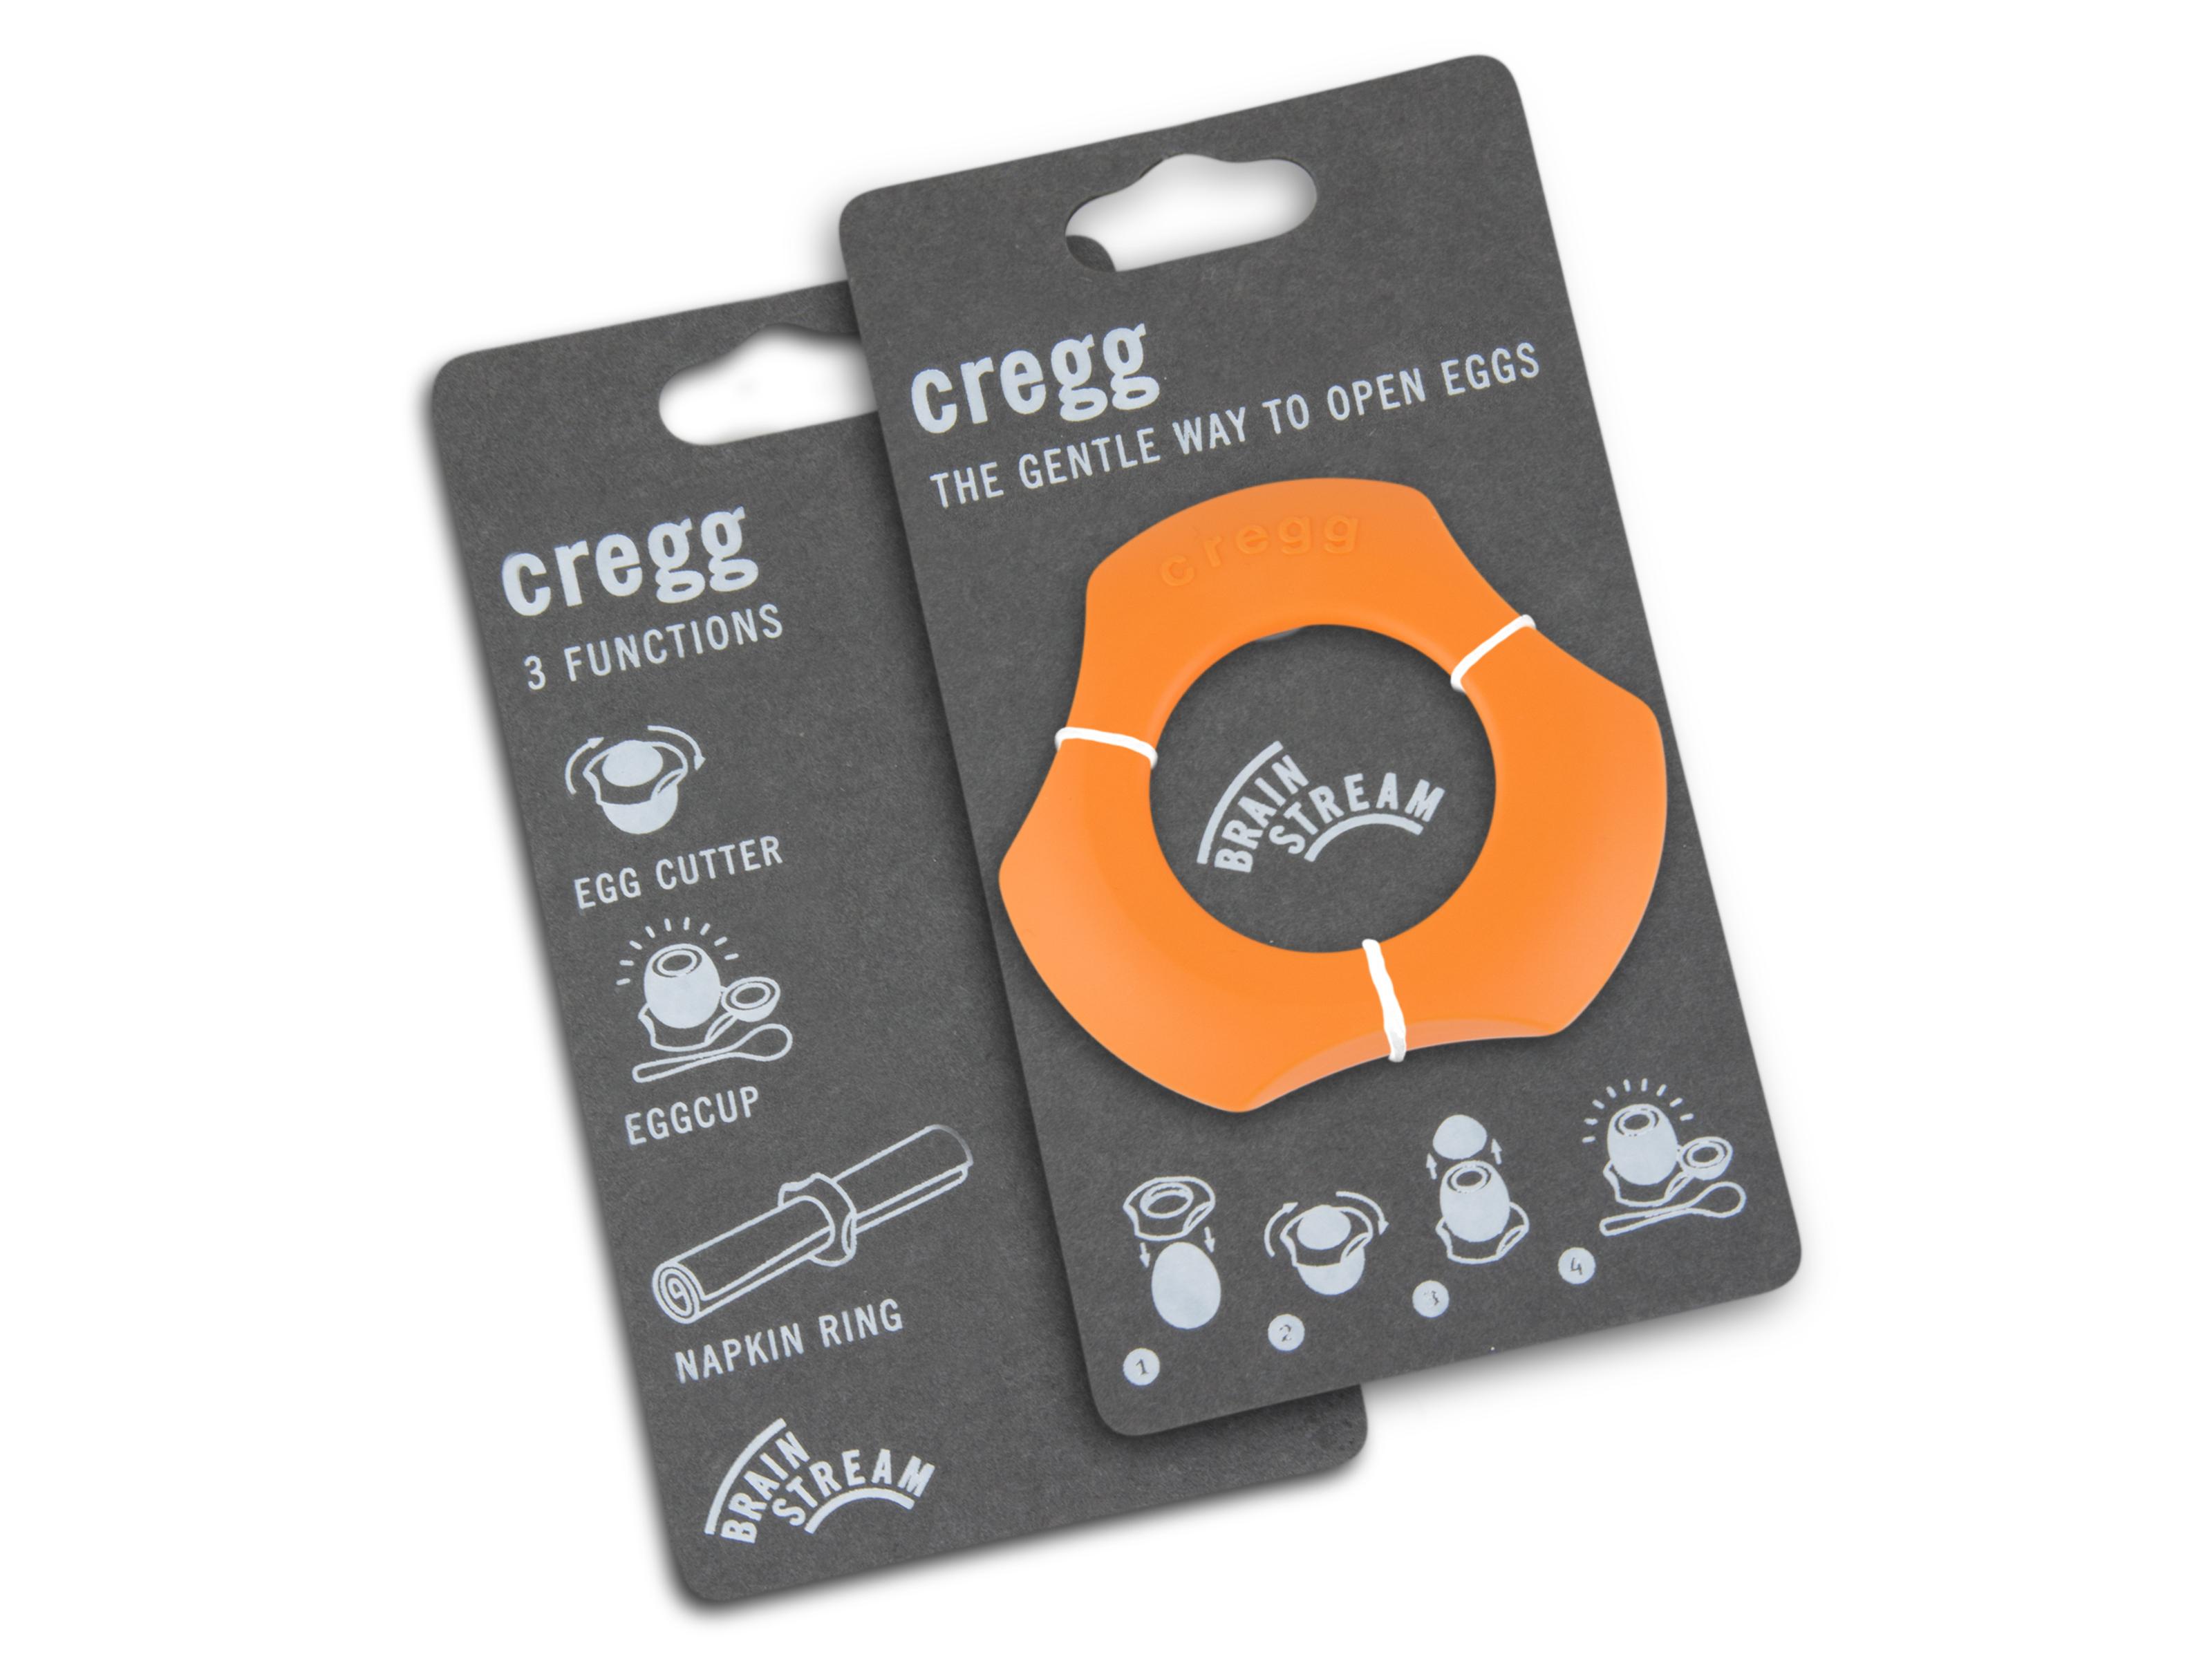 Cregg A001276 Single Pack & Eggshell Cutter Eggcup Napkin Ring, Orange